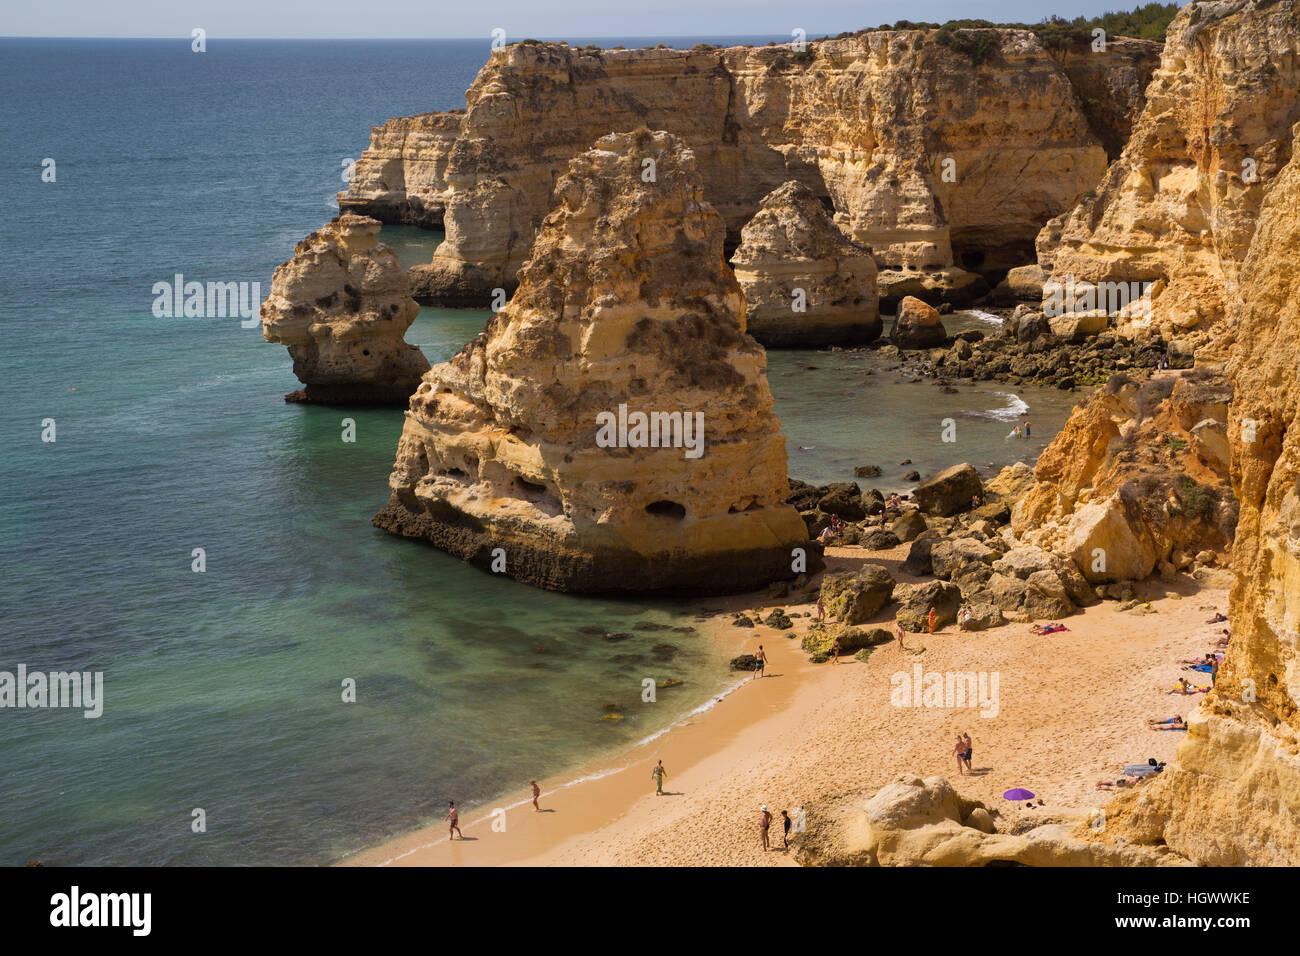 Marinha Beach, near Carvoeiro, Algarve, Portugal Stock Photo